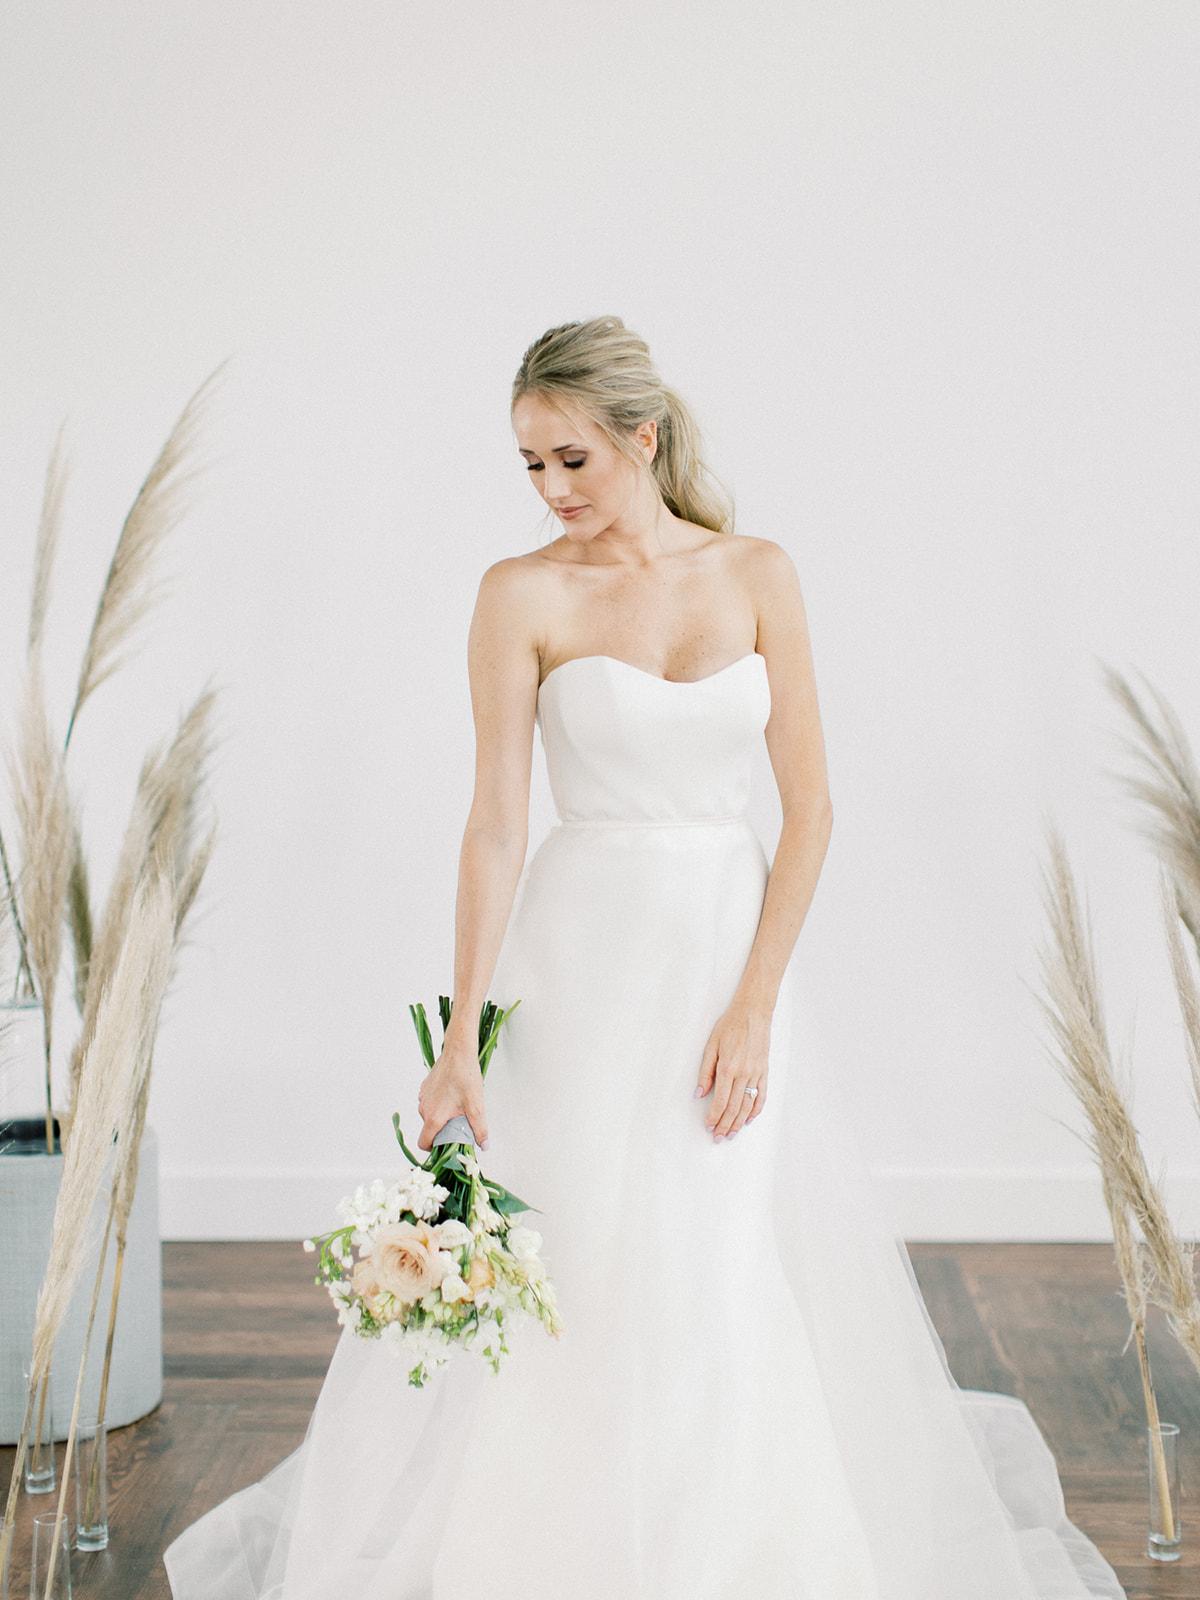 Wedding dress inspiration: Clean & Modern Styled Shoot at 14TENN featured on Nashville Bride Guide